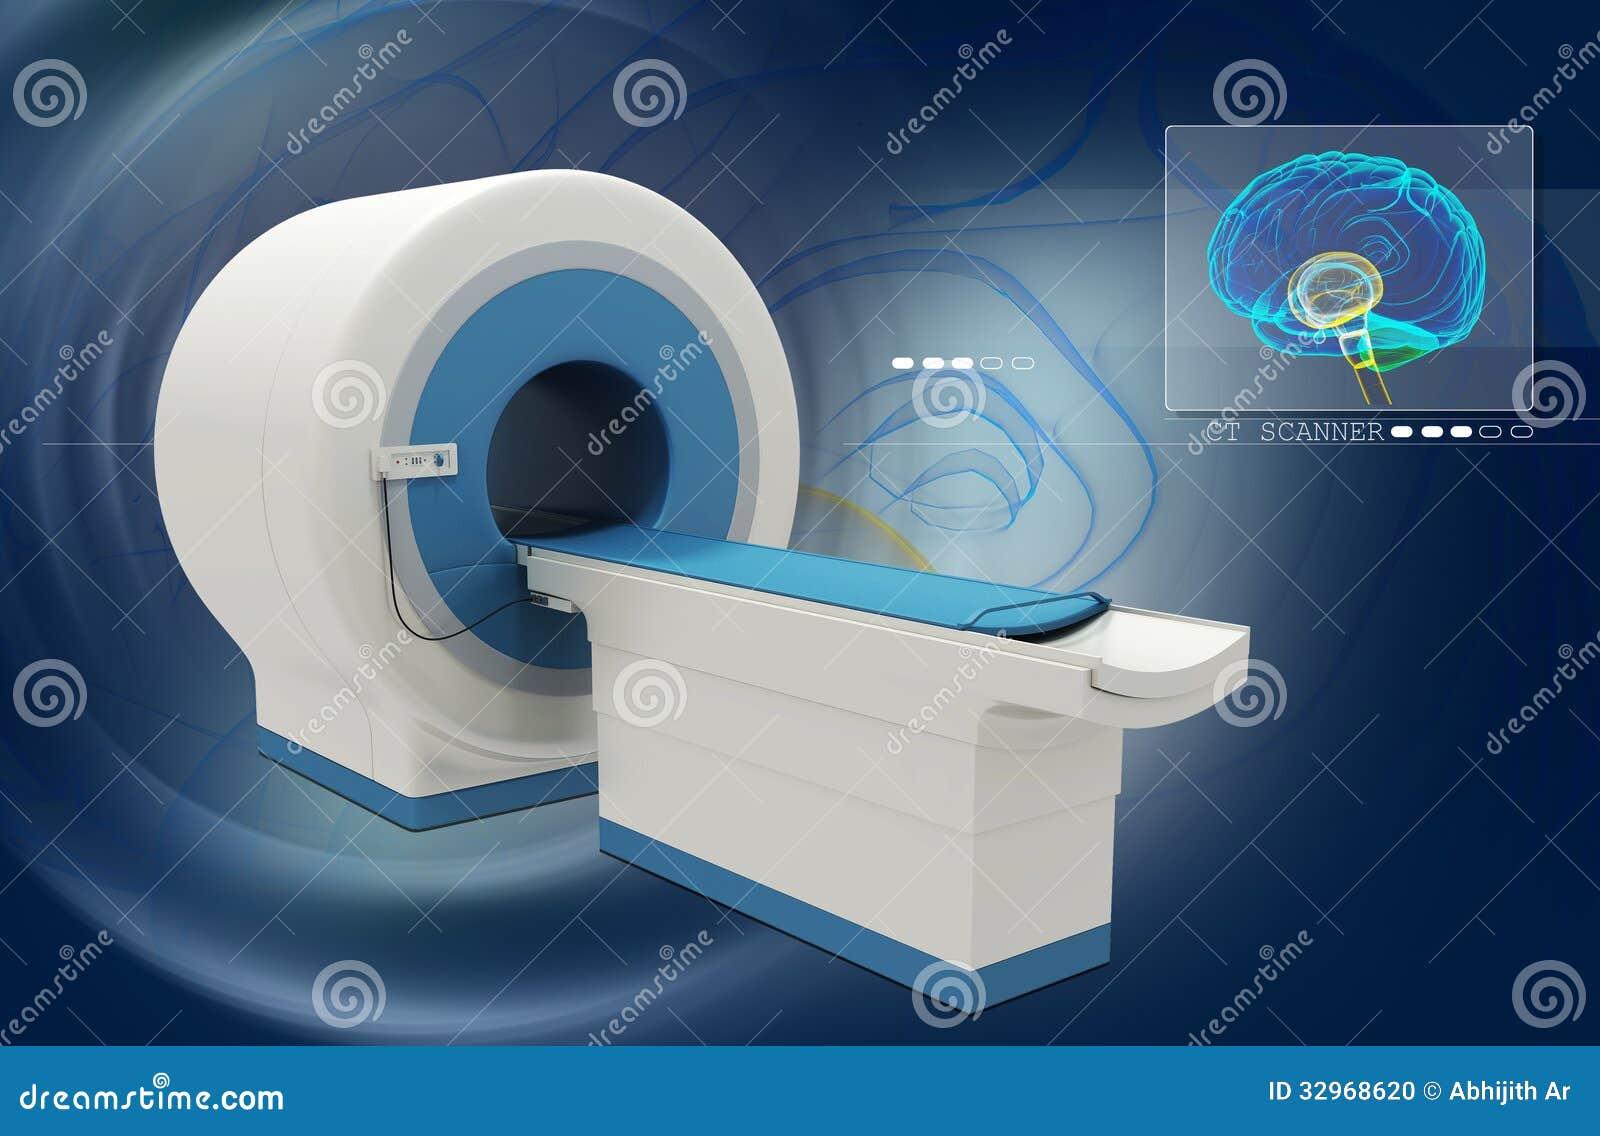 price of cat scan machine